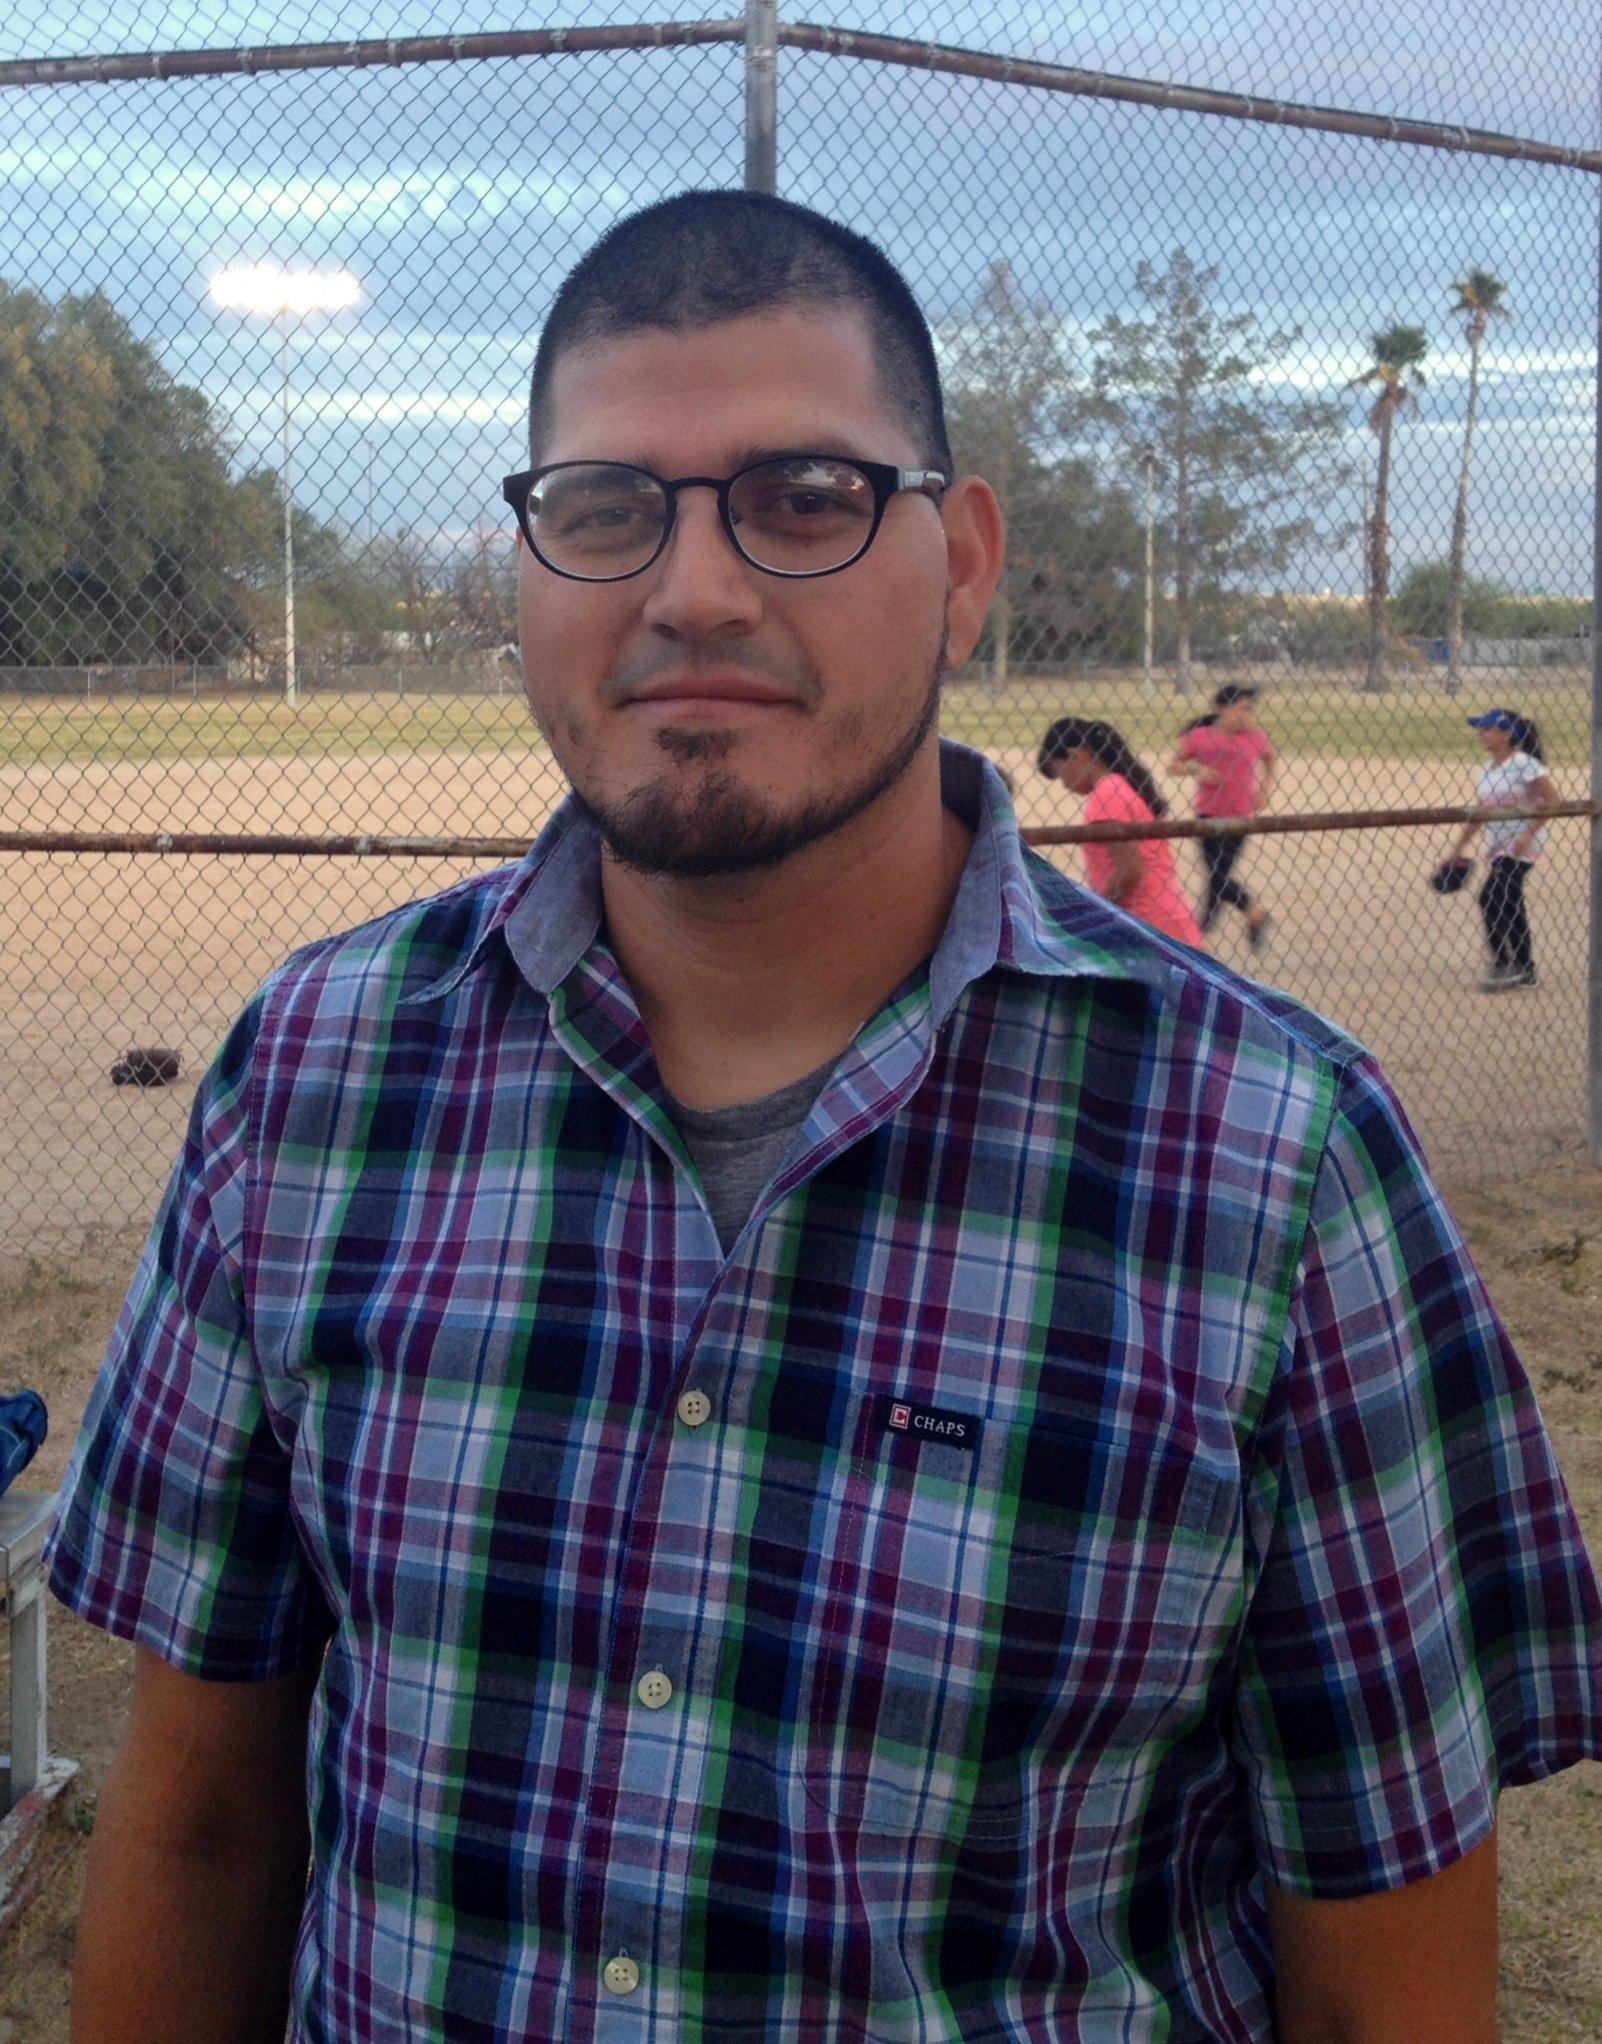 Ivan Hurtado Lopez of Tucson